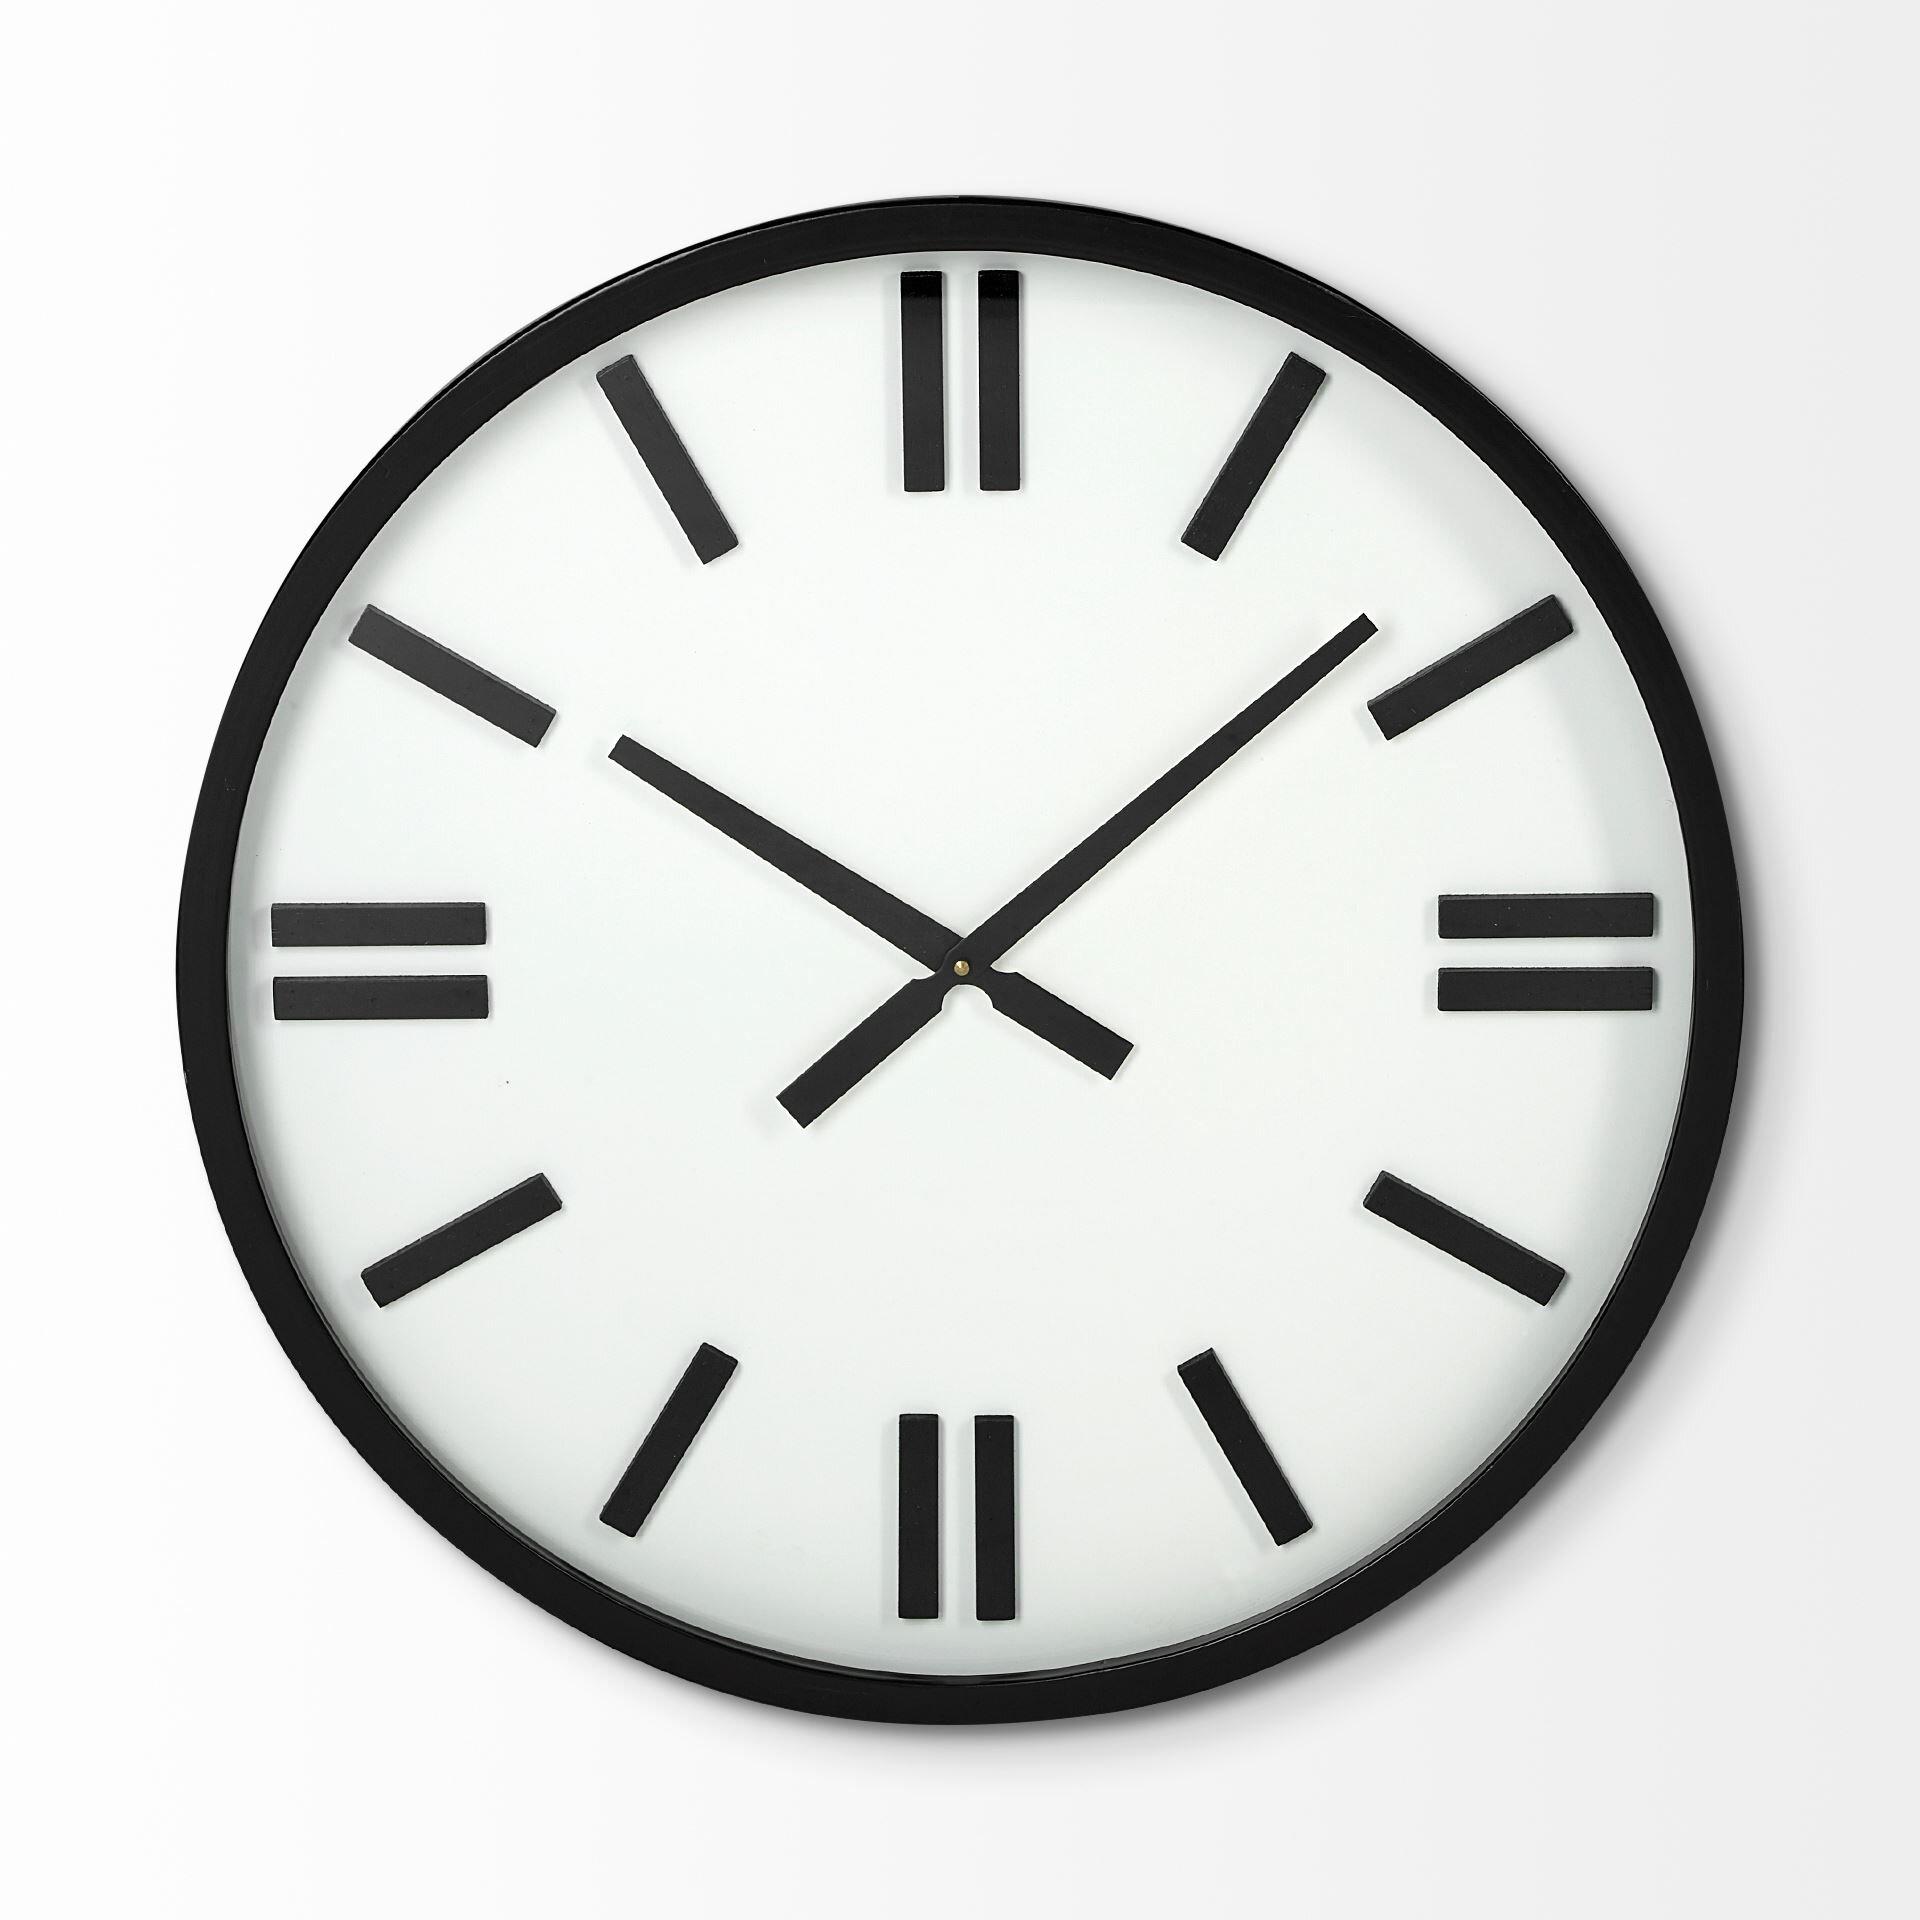 Modern Contemporary Wall Clocks You Ll Love In 2021 Wayfair Ca